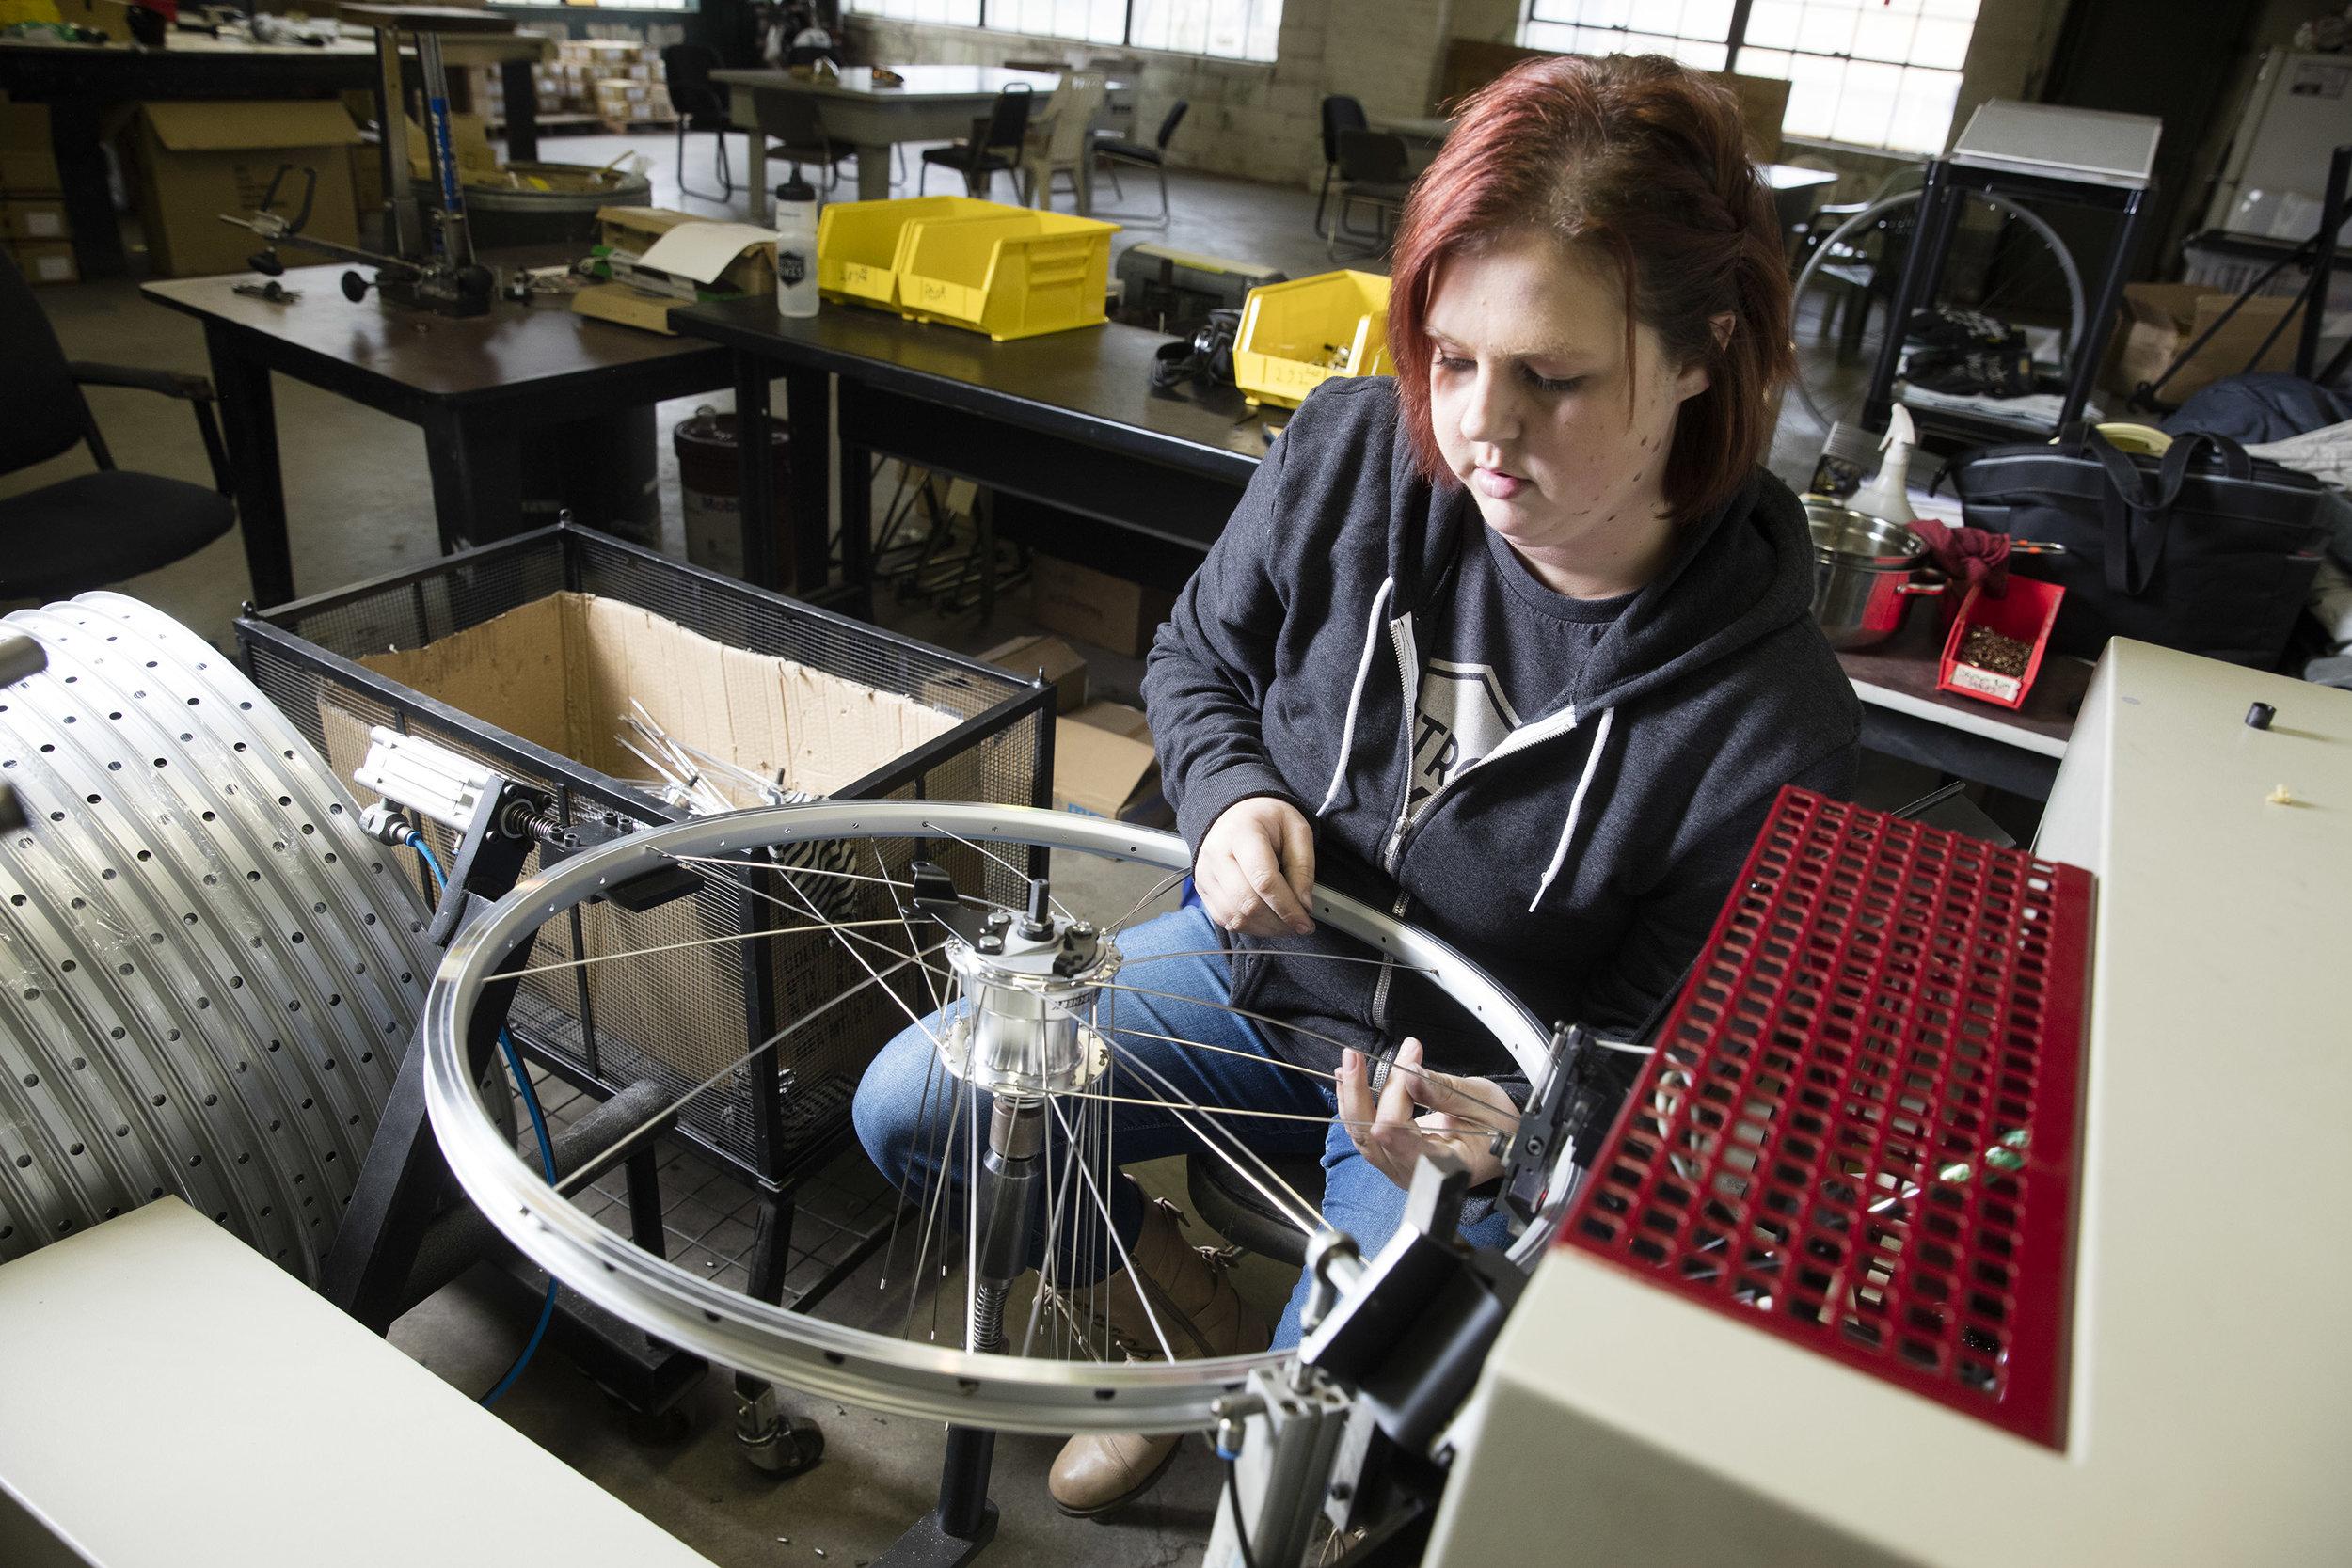 Detroit_Bikes_0843.jpg